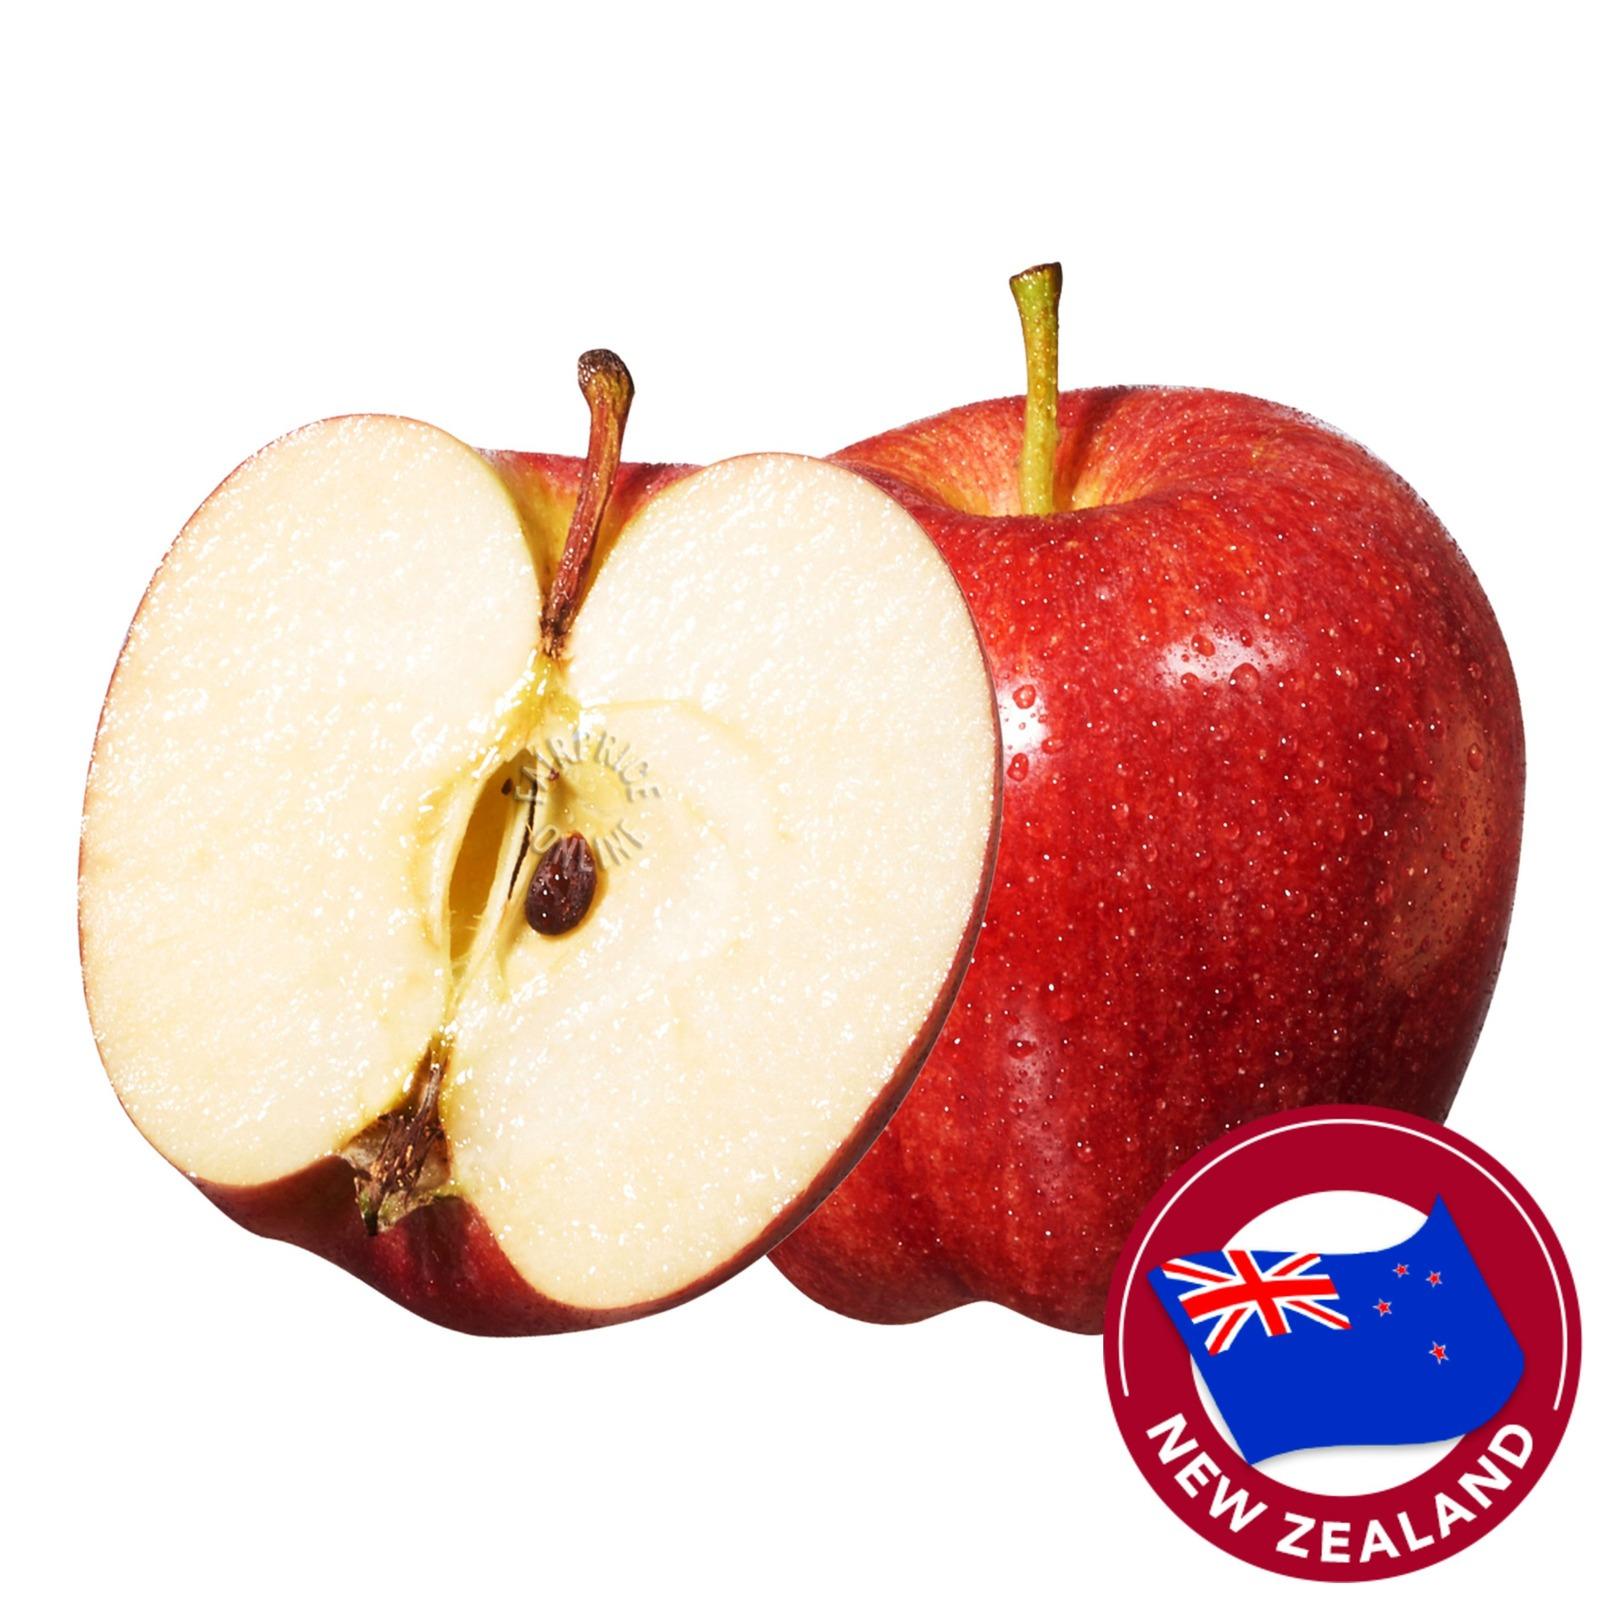 Apple Fiesta New Zealand Apple Bag - Royal Gala